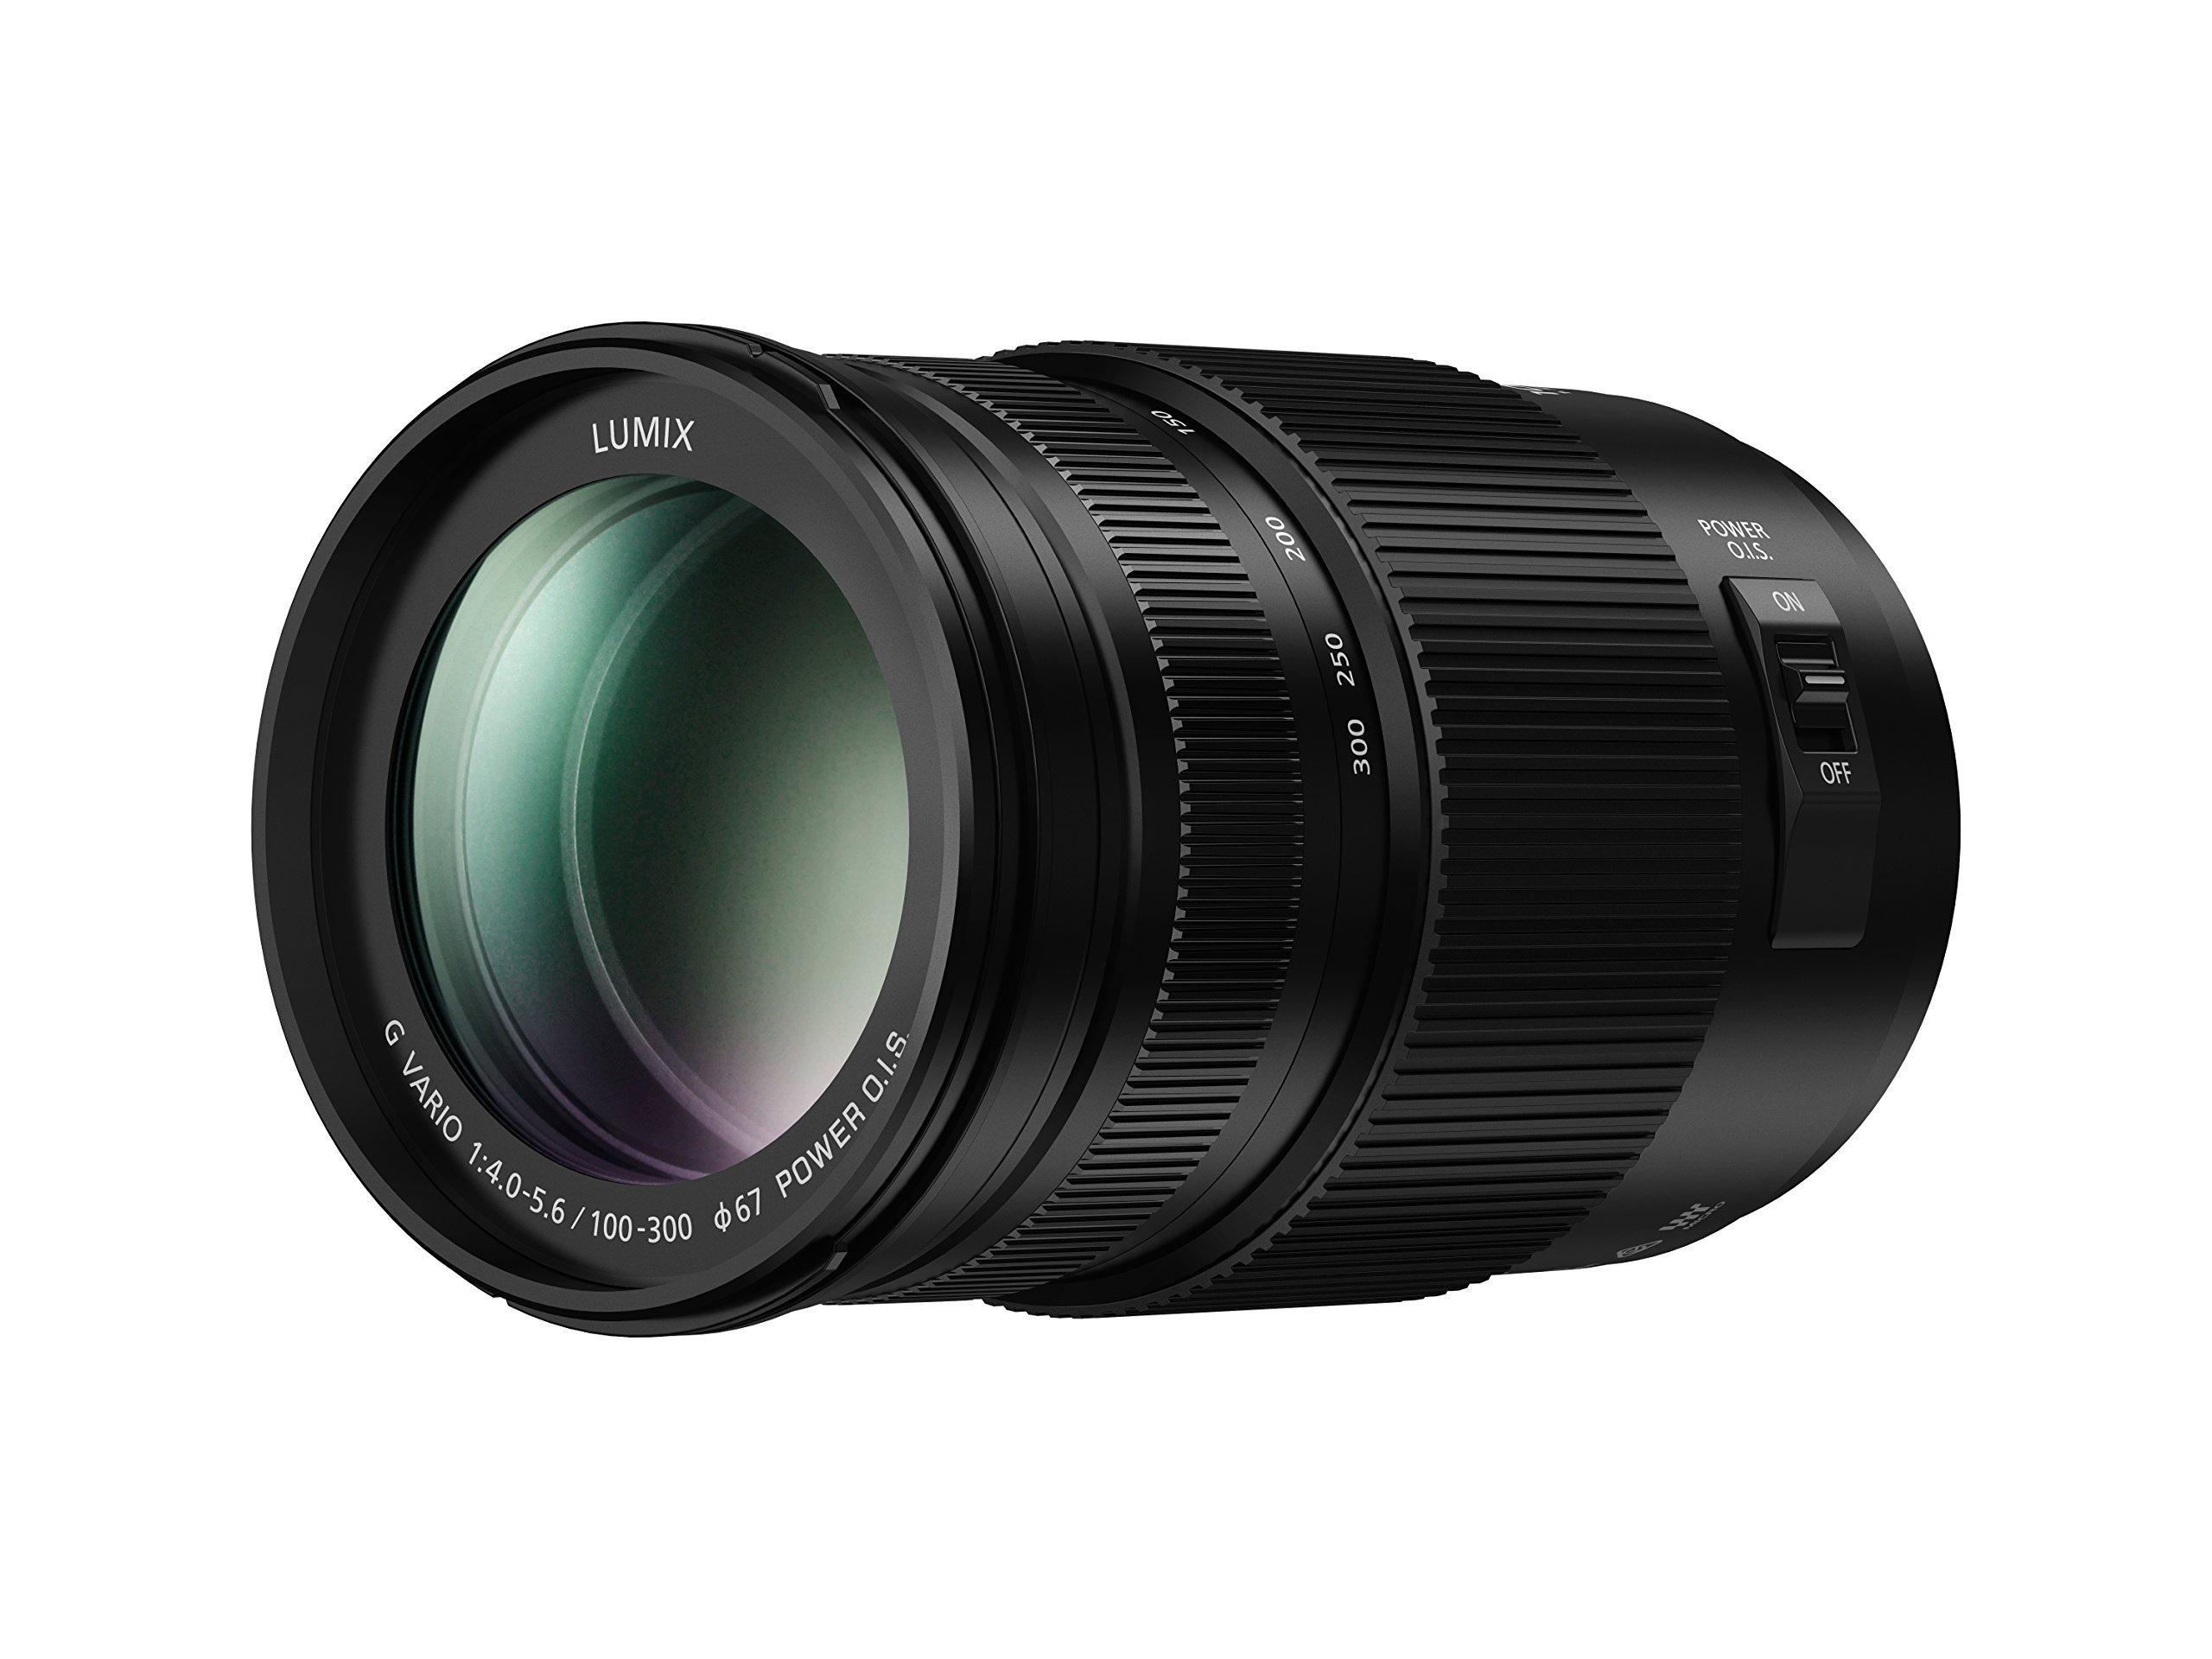 PANASONIC LUMIX G II Vario Lens, 100-300MM, MIRRORLESS Micro Four Thirds, Power O.I.S, H-FSA100300 (USA Black) (Renewed) by Panasonic